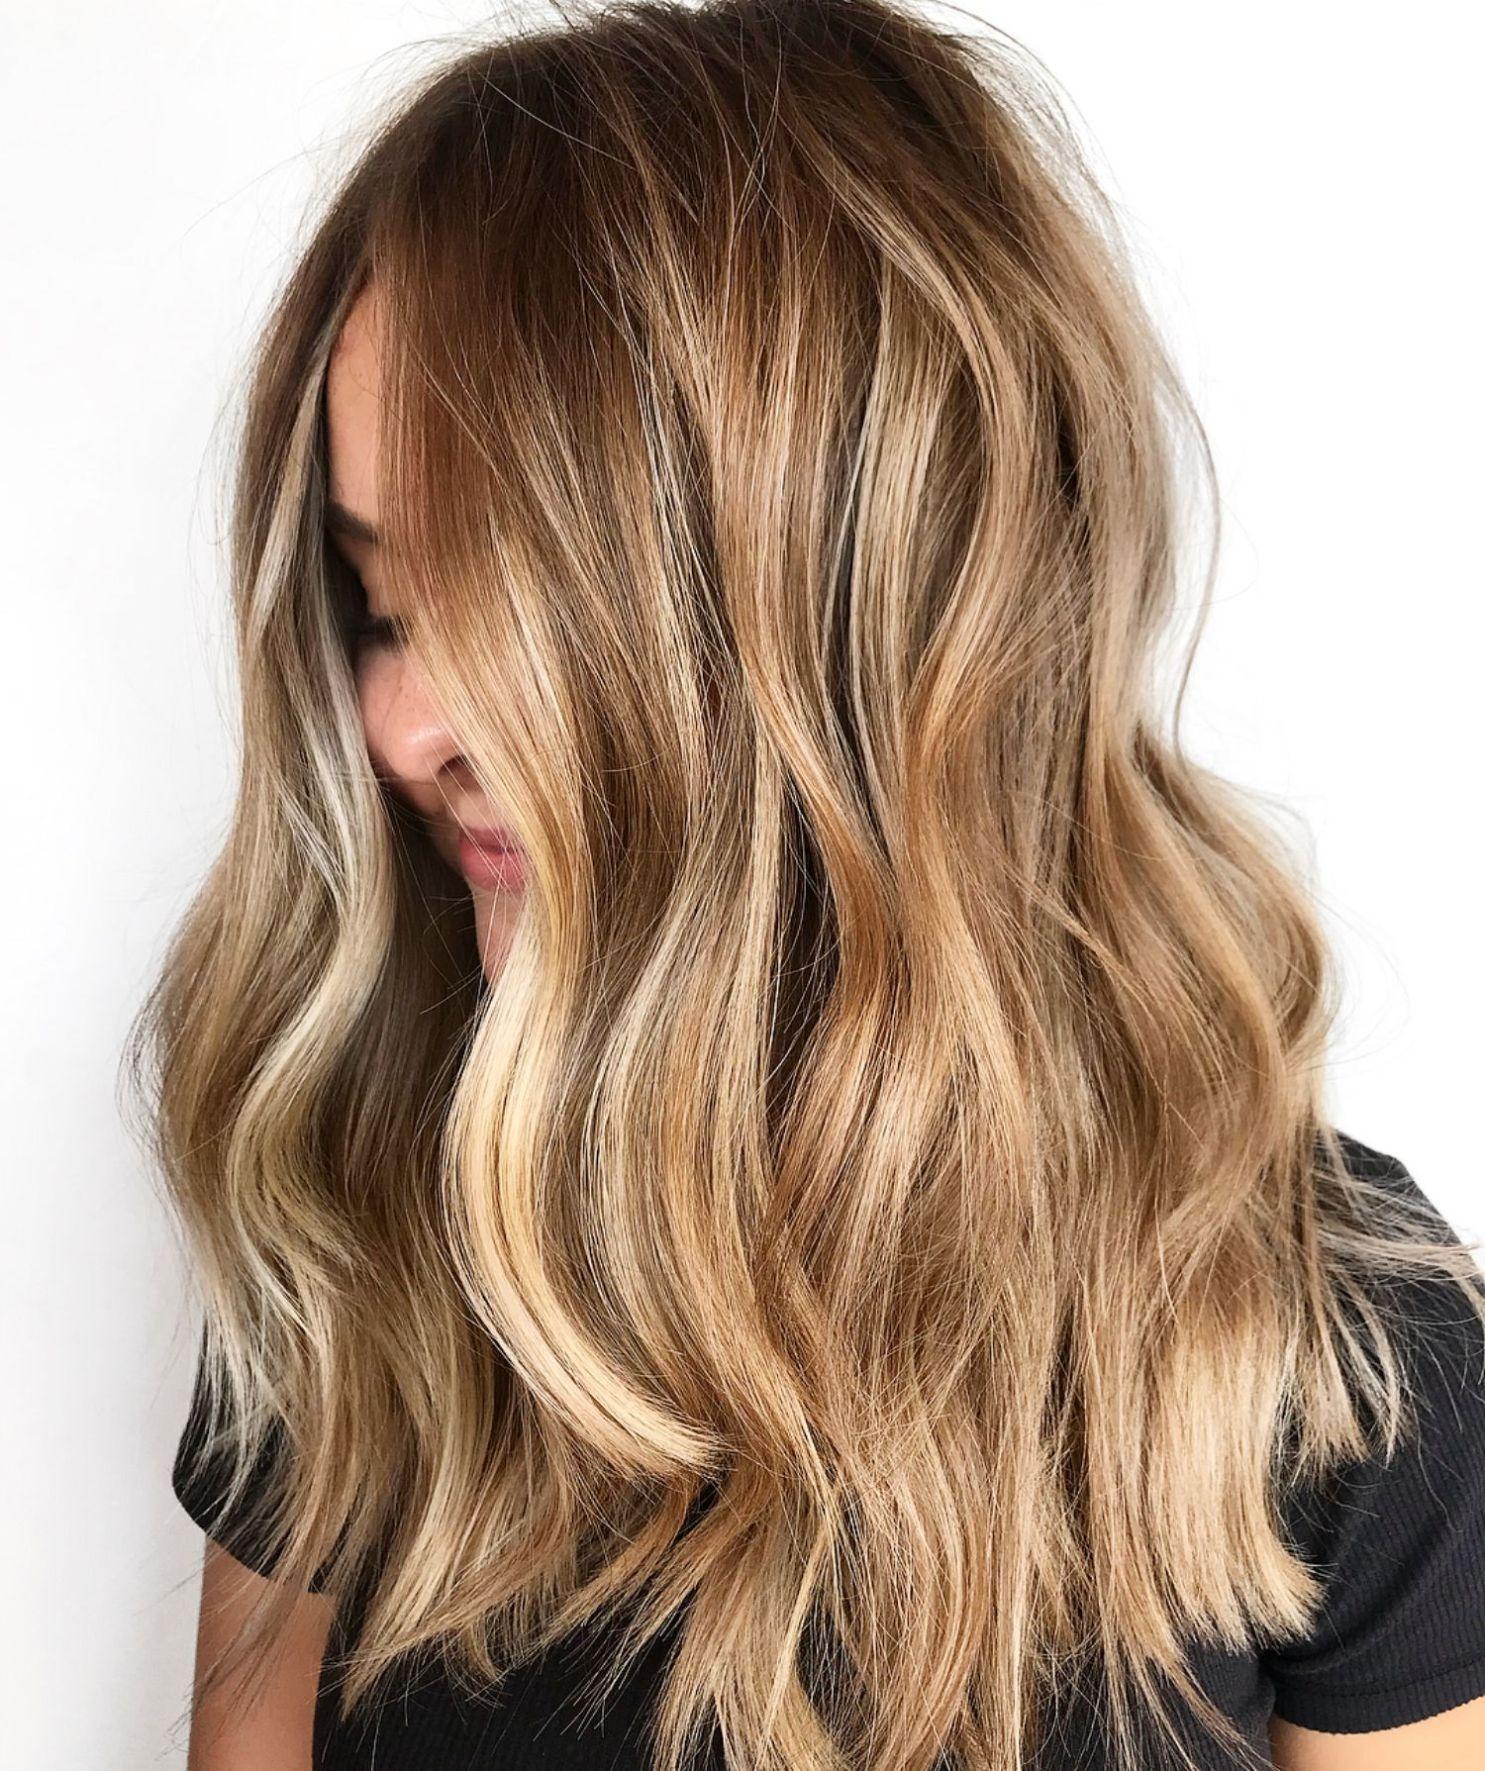 Dark Blonde Hair With Caramel Highlights I 2020